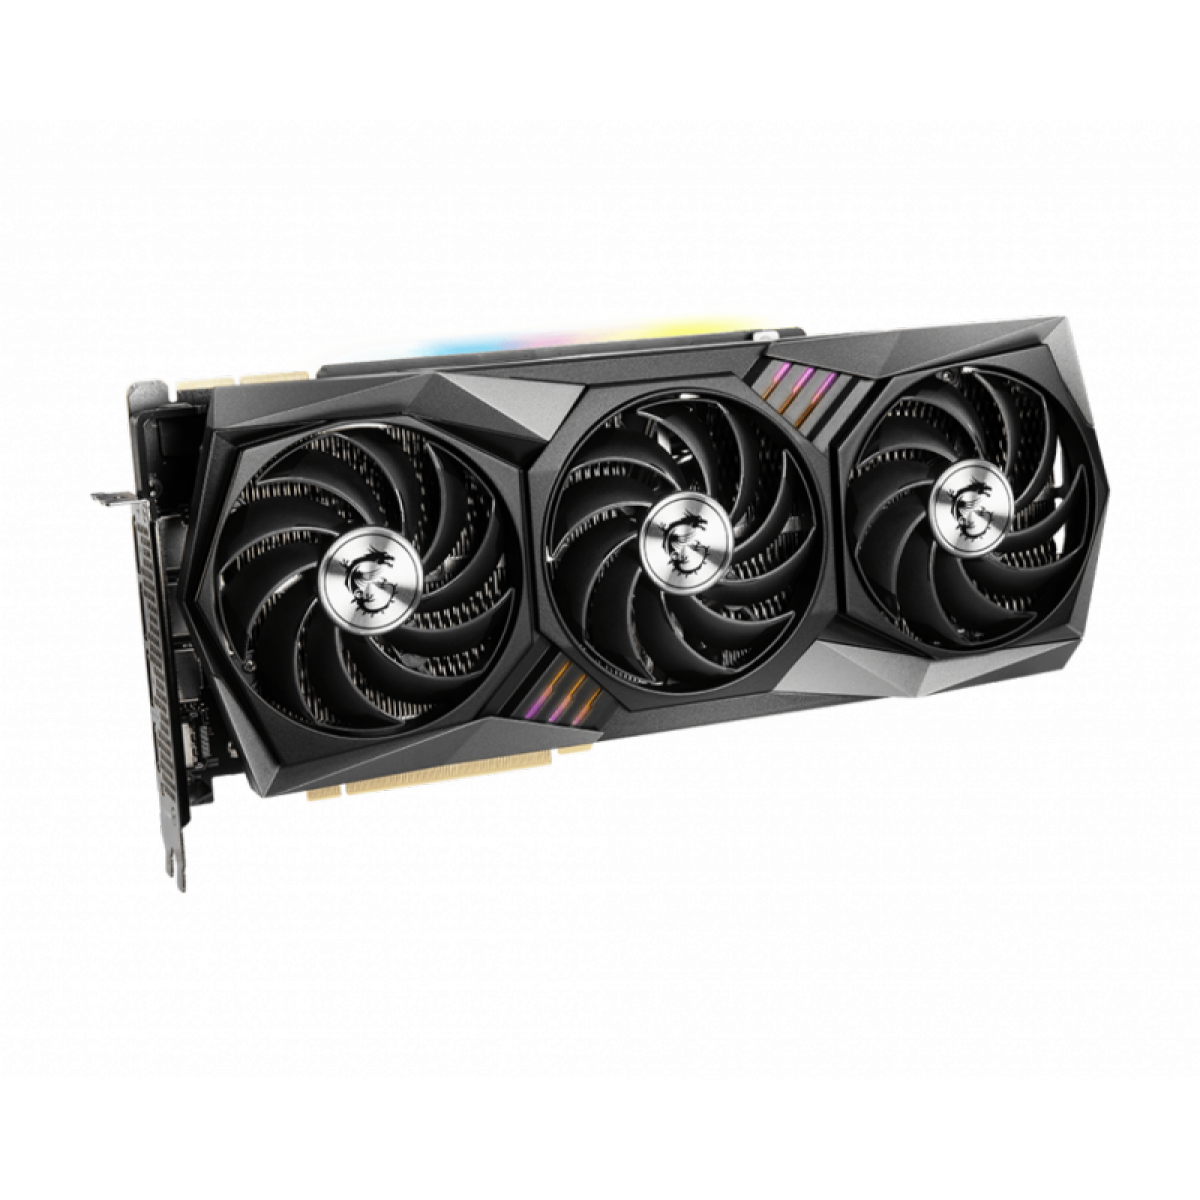 Placa de Vídeo MSI, GeForce, RTX 3090 Gaming X Trio, 24GB, GDDR6X, 384Bit